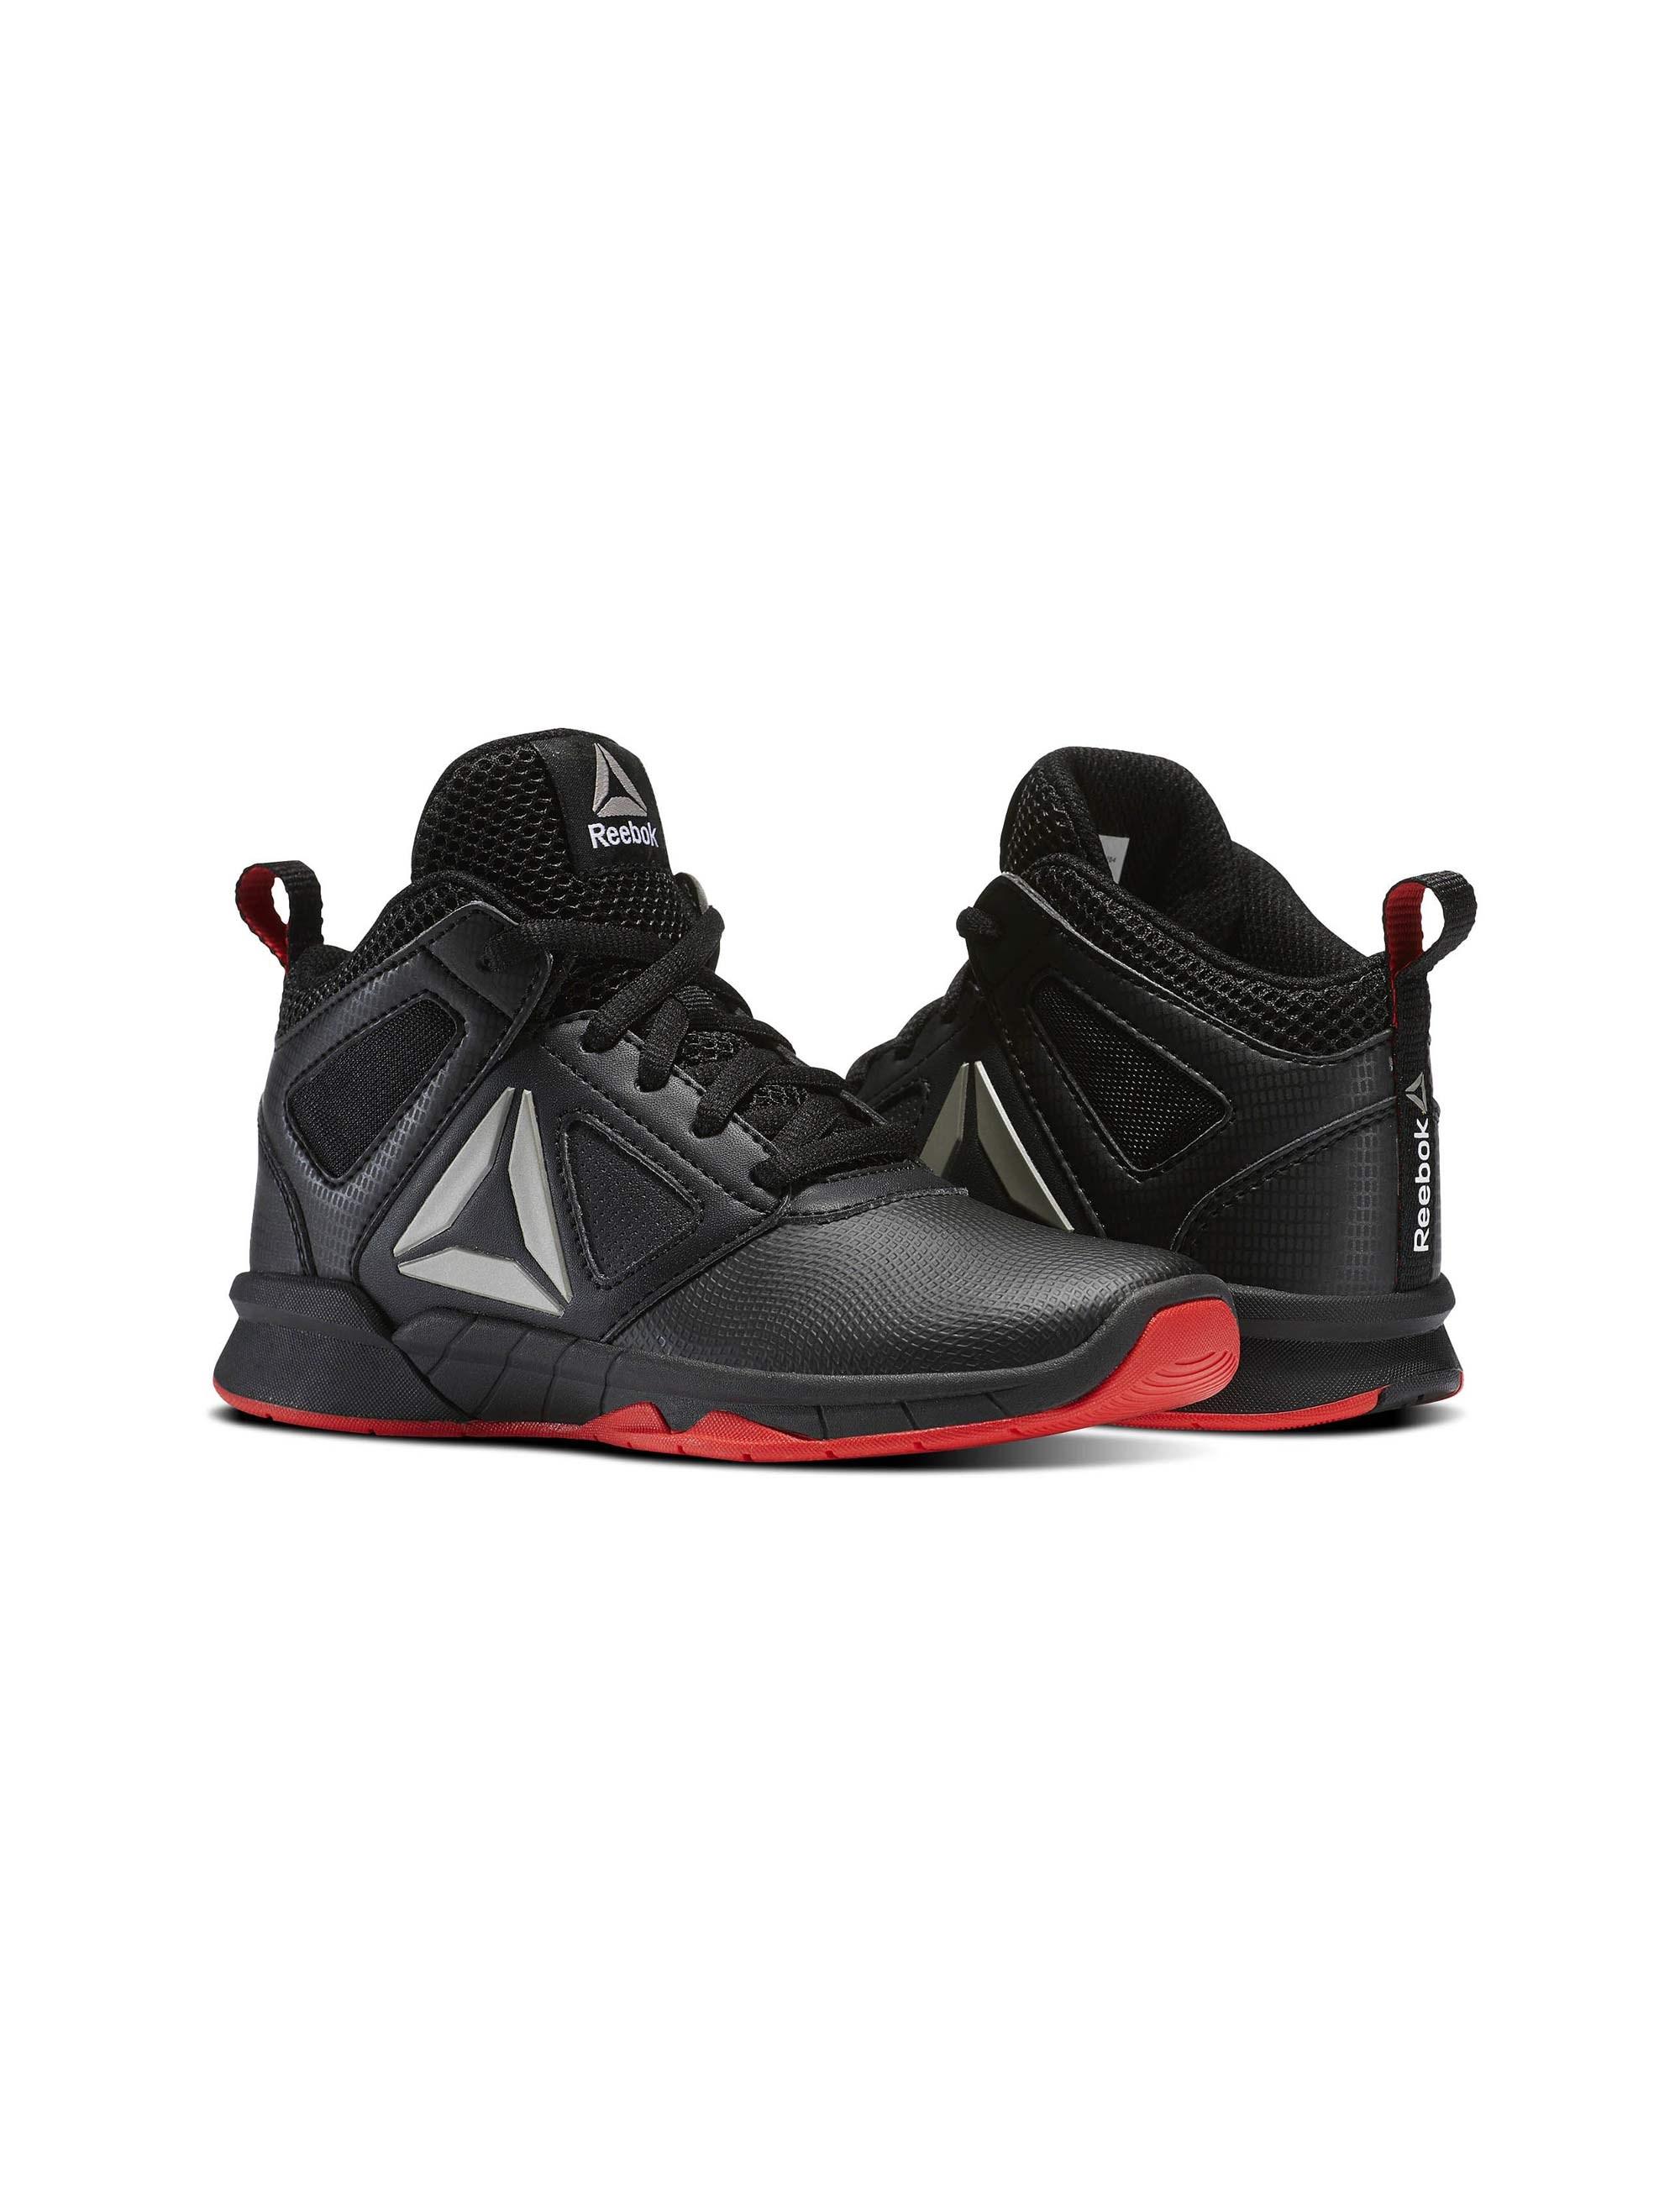 کفش بسکتبال بندی پسرانه Royal Dash N Drill - مشکي - 4